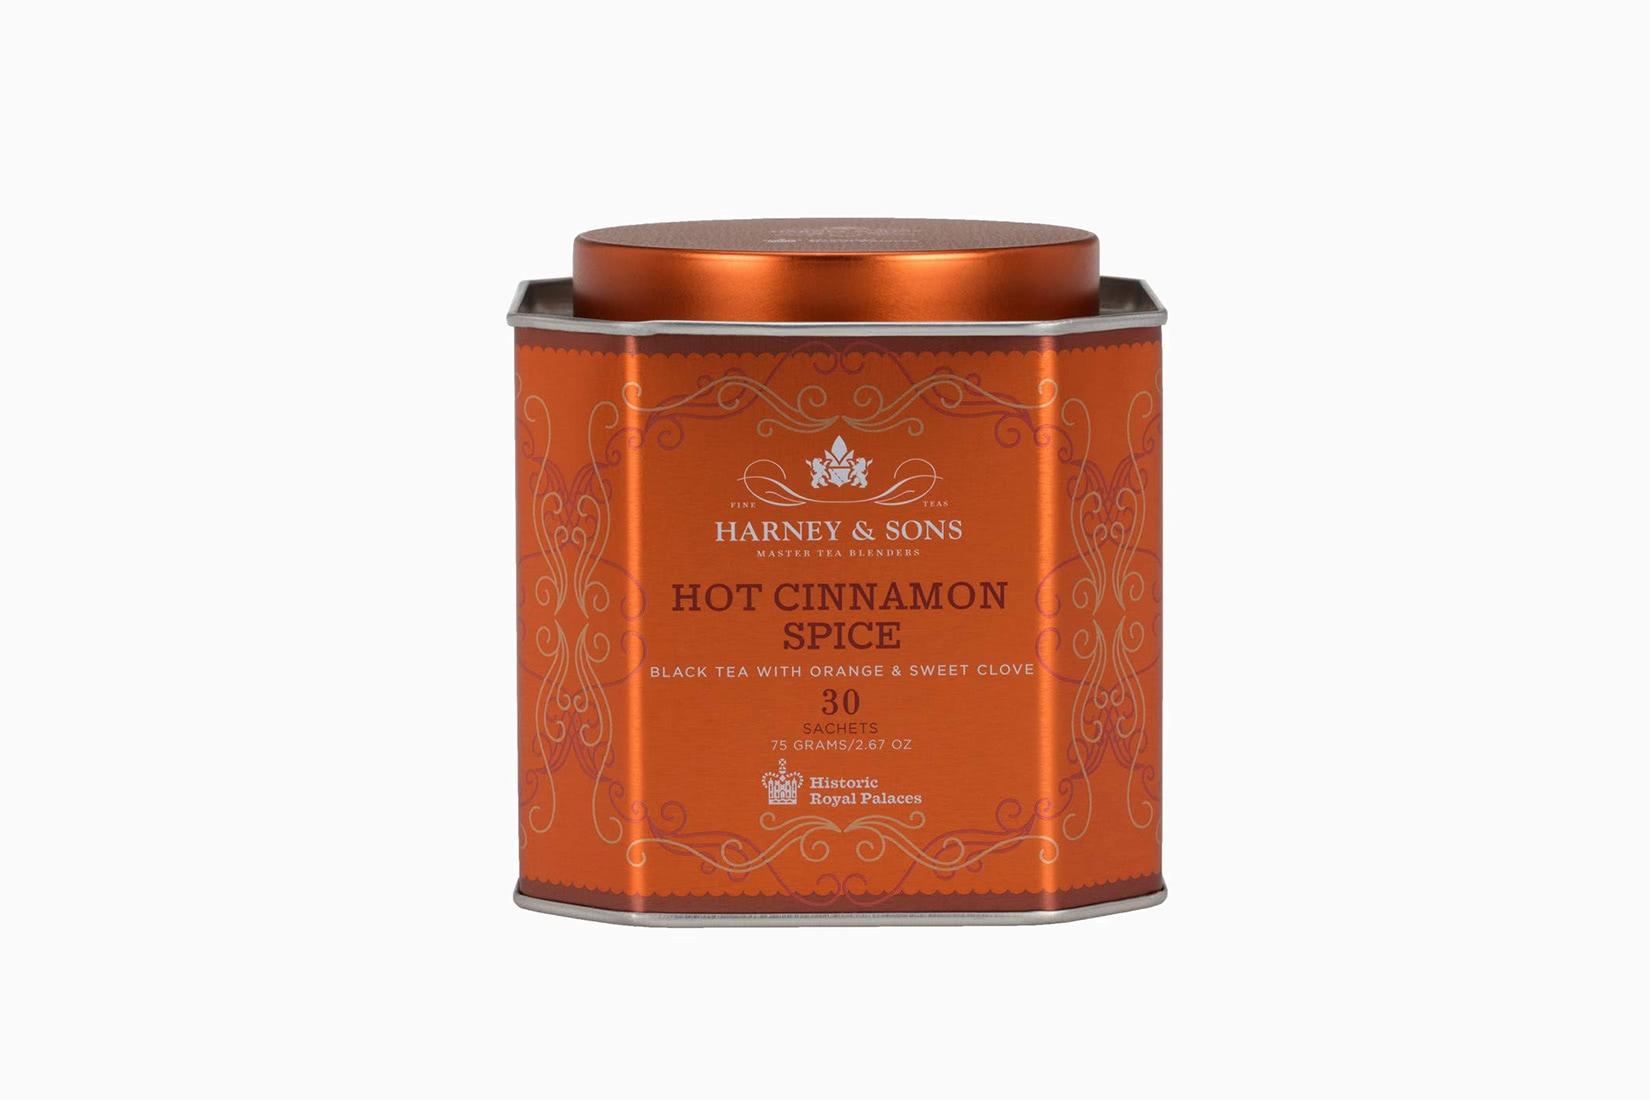 best tea brands black harney & sons - Luxe Digital